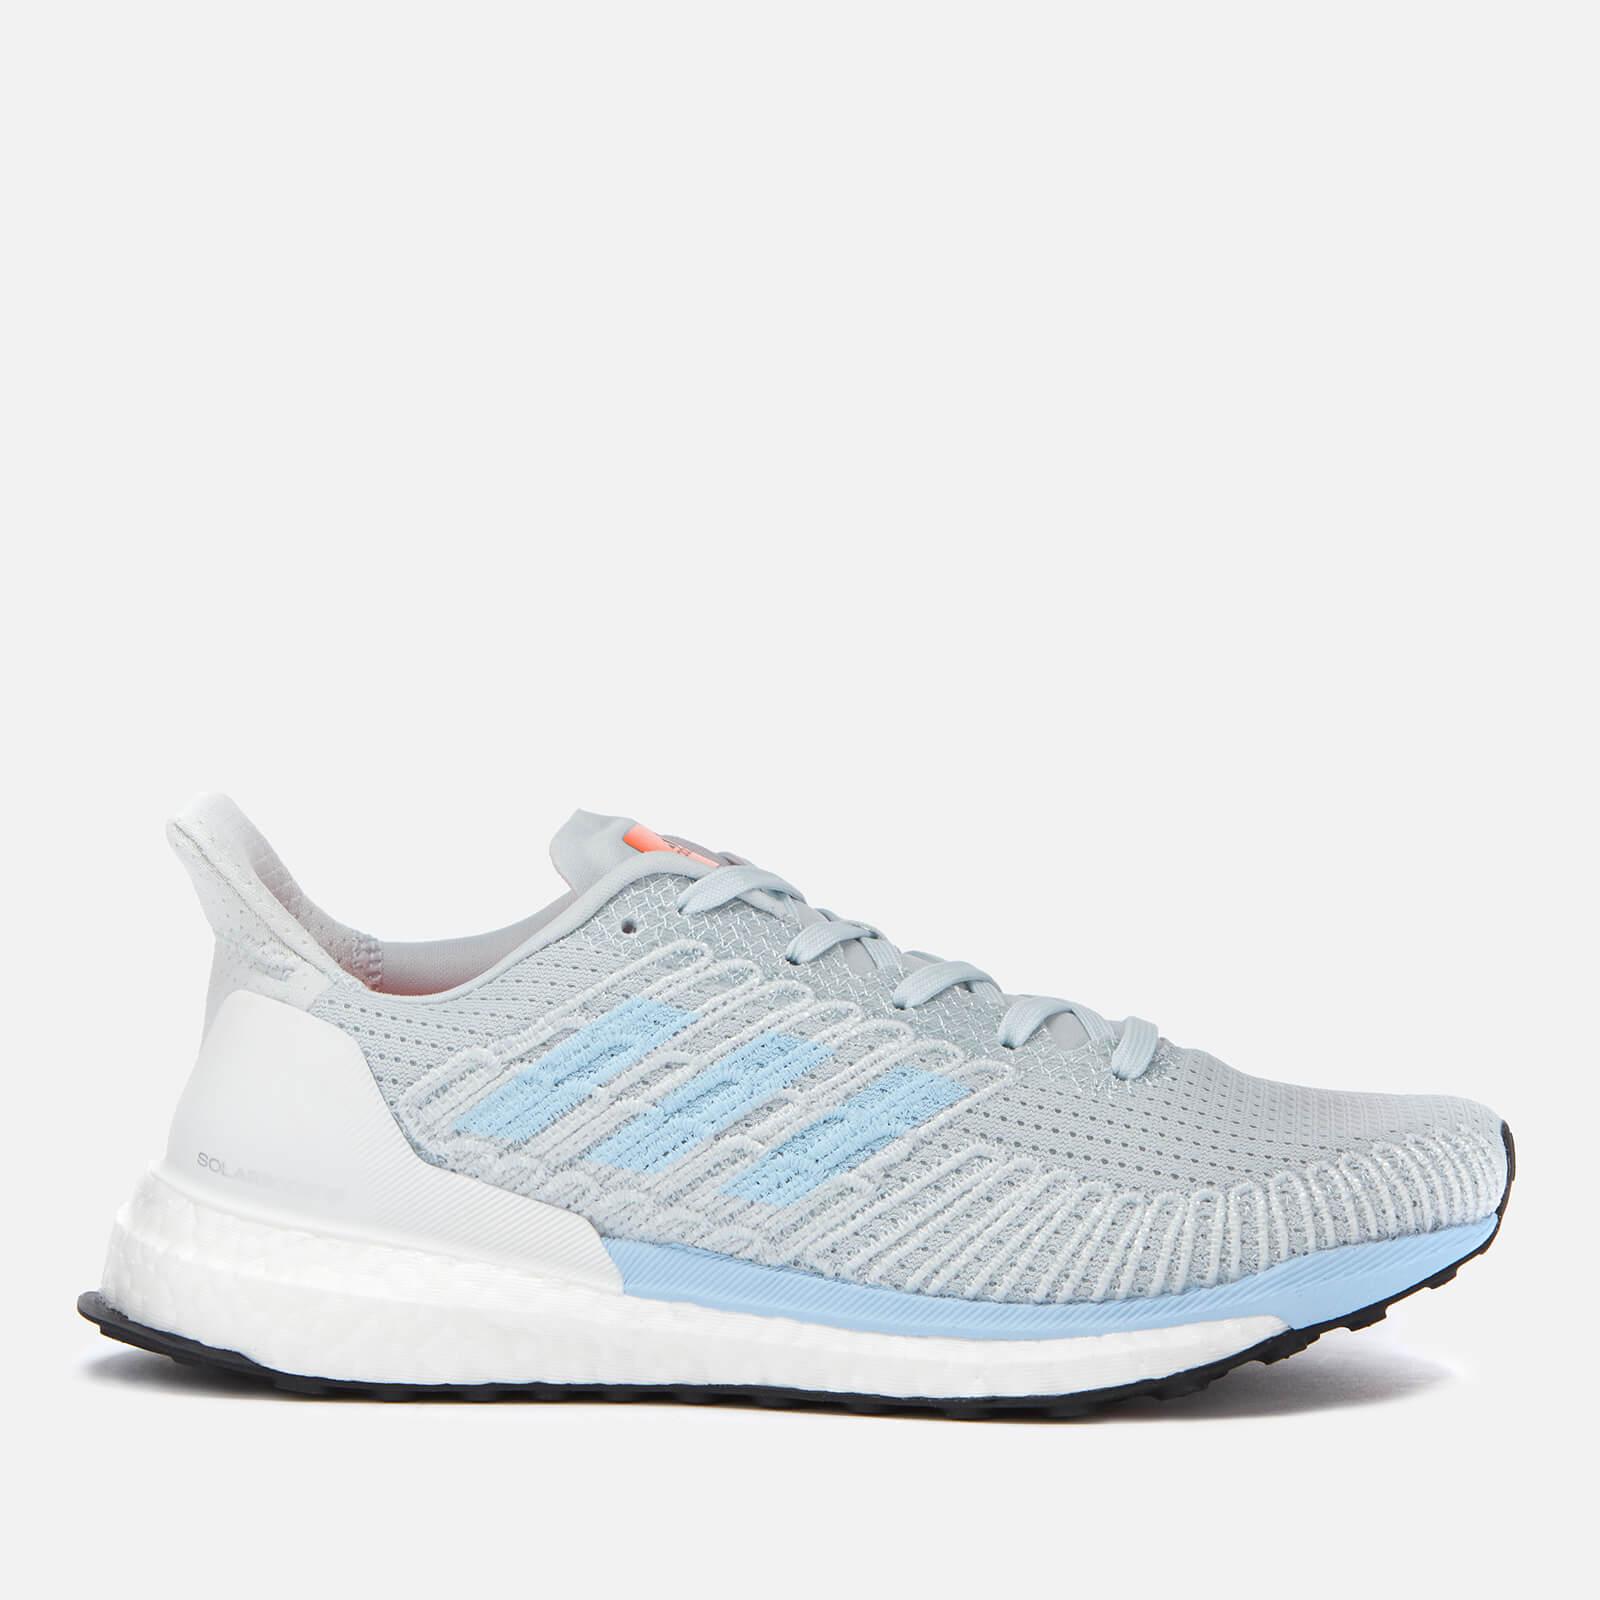 adidas Women's Solar Boost St Trainers - Blue - UK 6 - Blue